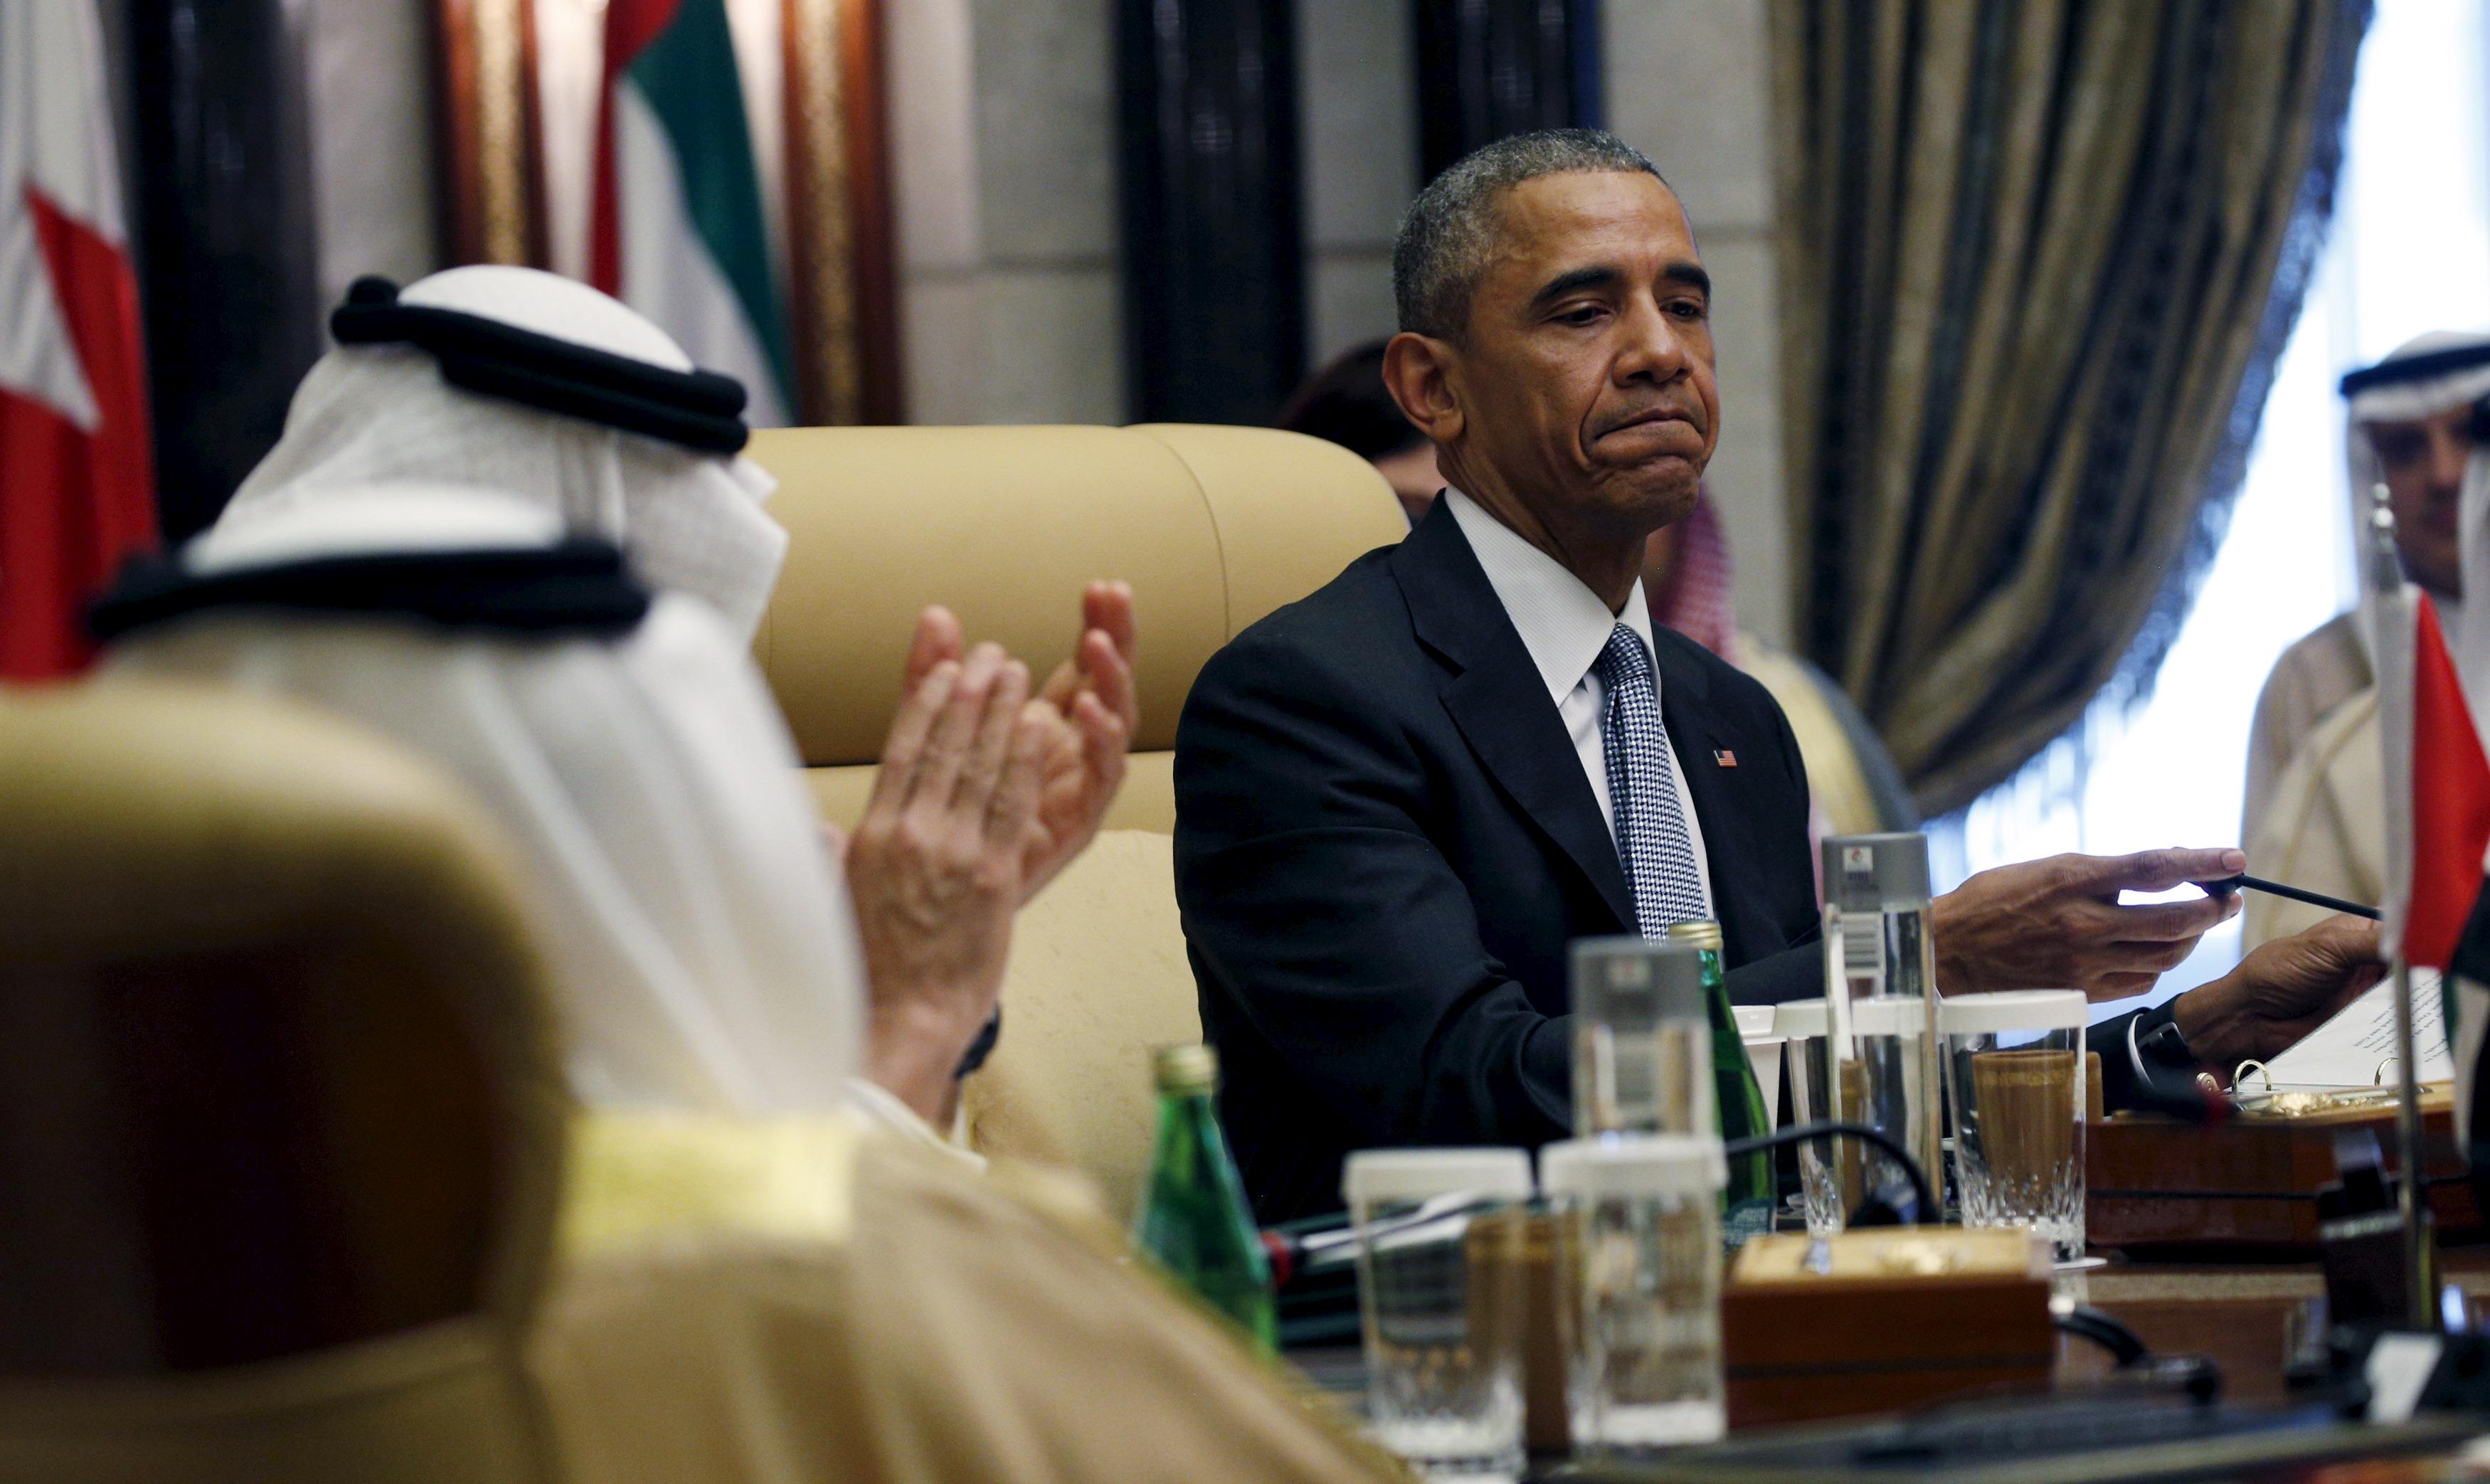 President Barack Obama at a summit of the Gulf Cooperation Council in Riyadh, Saudi Arabia.